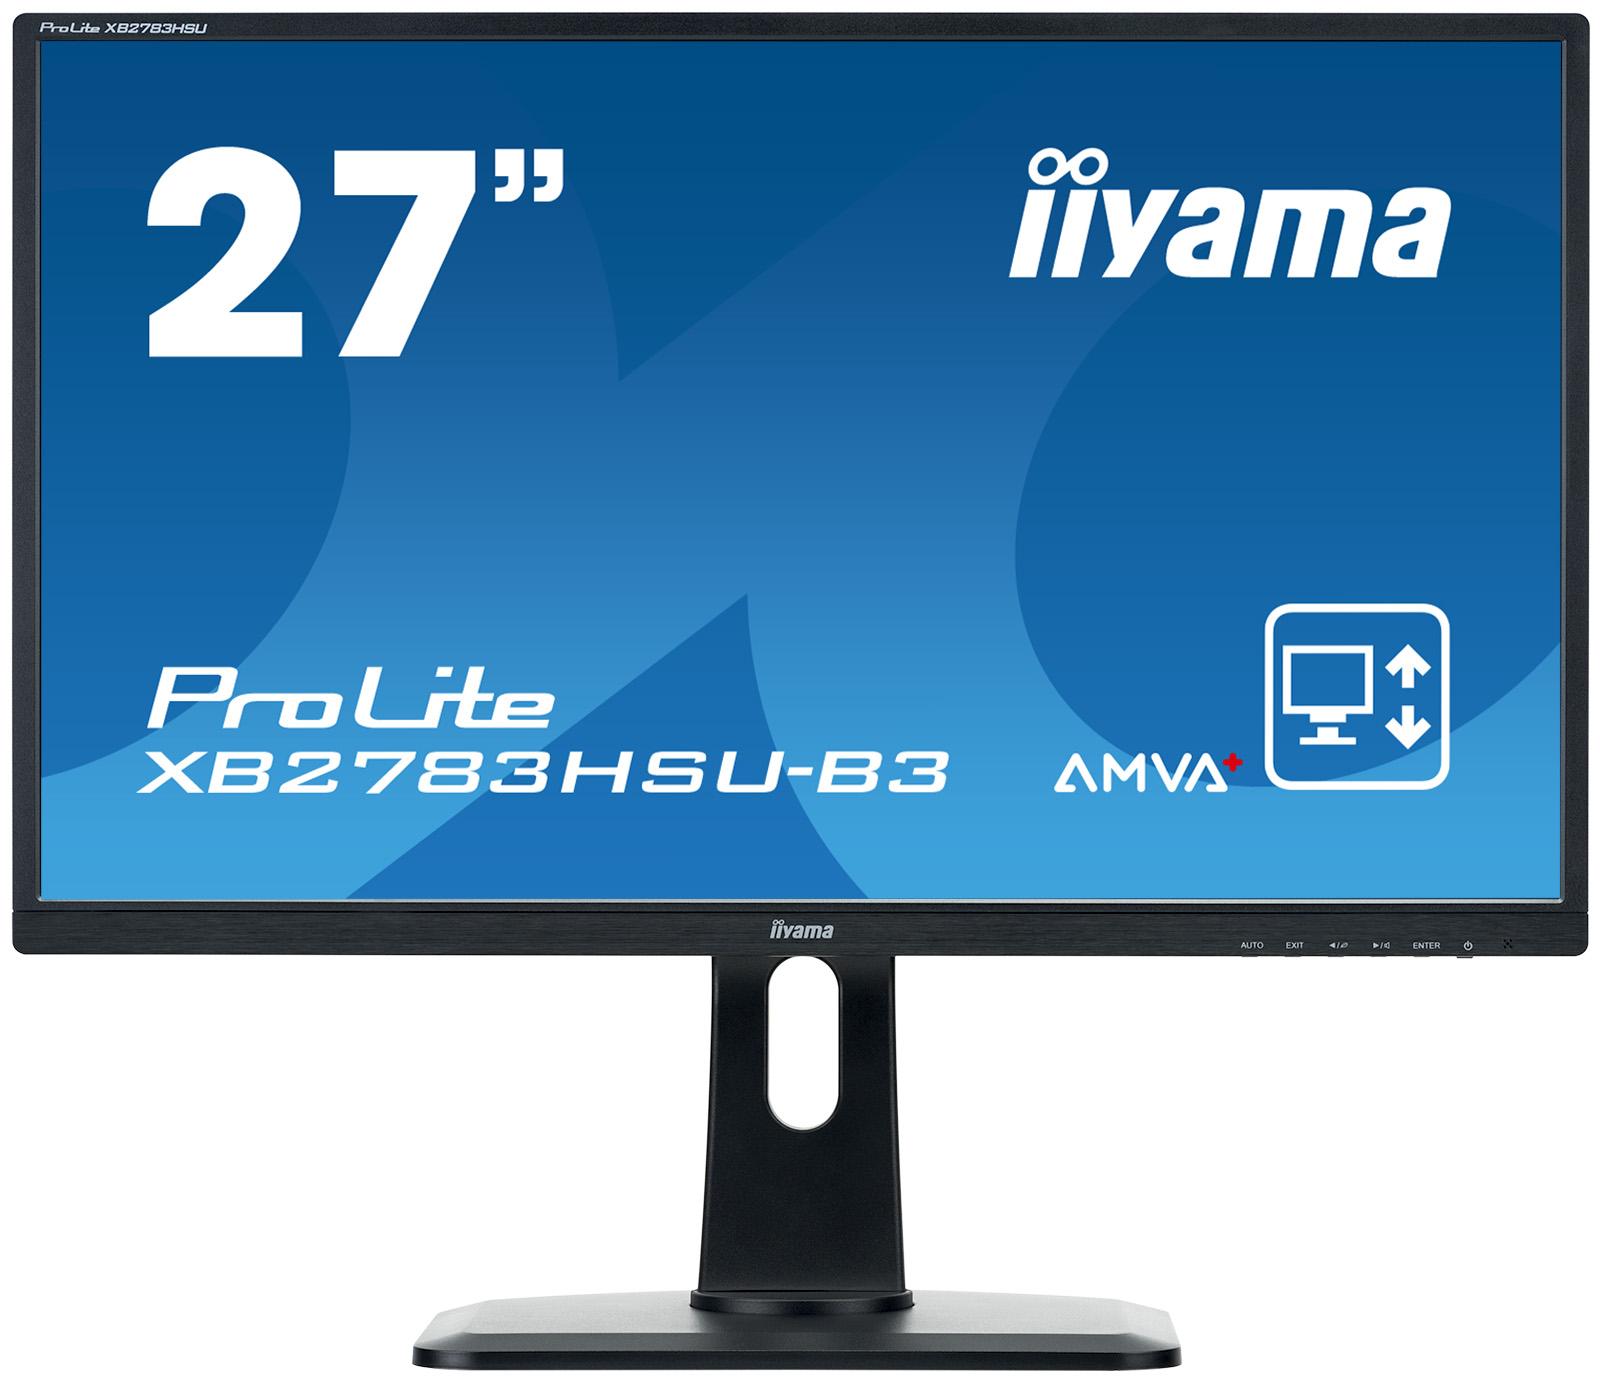 "27"" LCD iiyama XB2783HSU-B3 -AMVA+,4ms,300cd/m2,3000:1,FHD,VGA,DVI,HDMI,USB,repro,pivot,výšk.nastav."